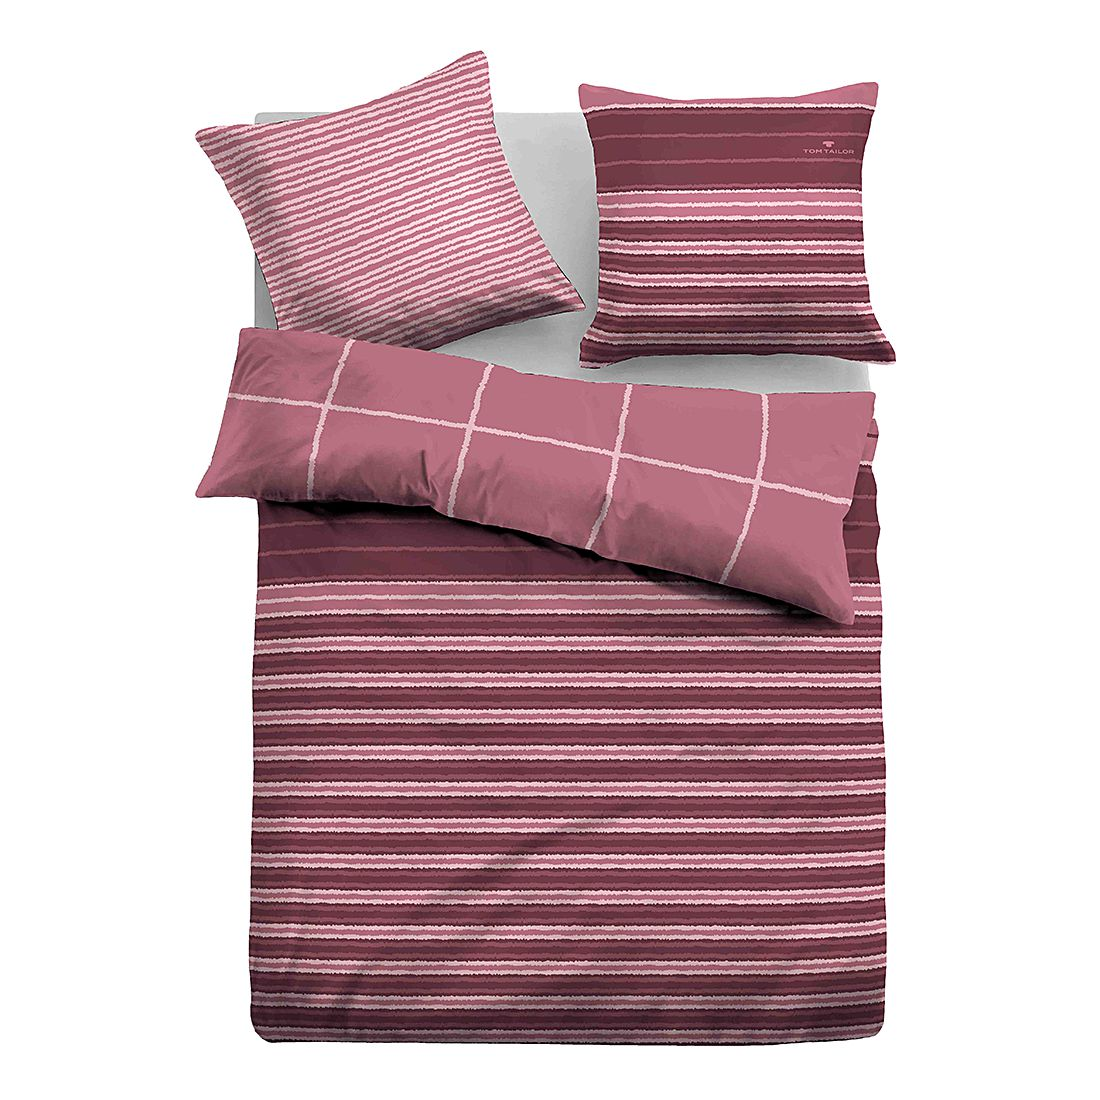 kissen bettw sche my blog. Black Bedroom Furniture Sets. Home Design Ideas